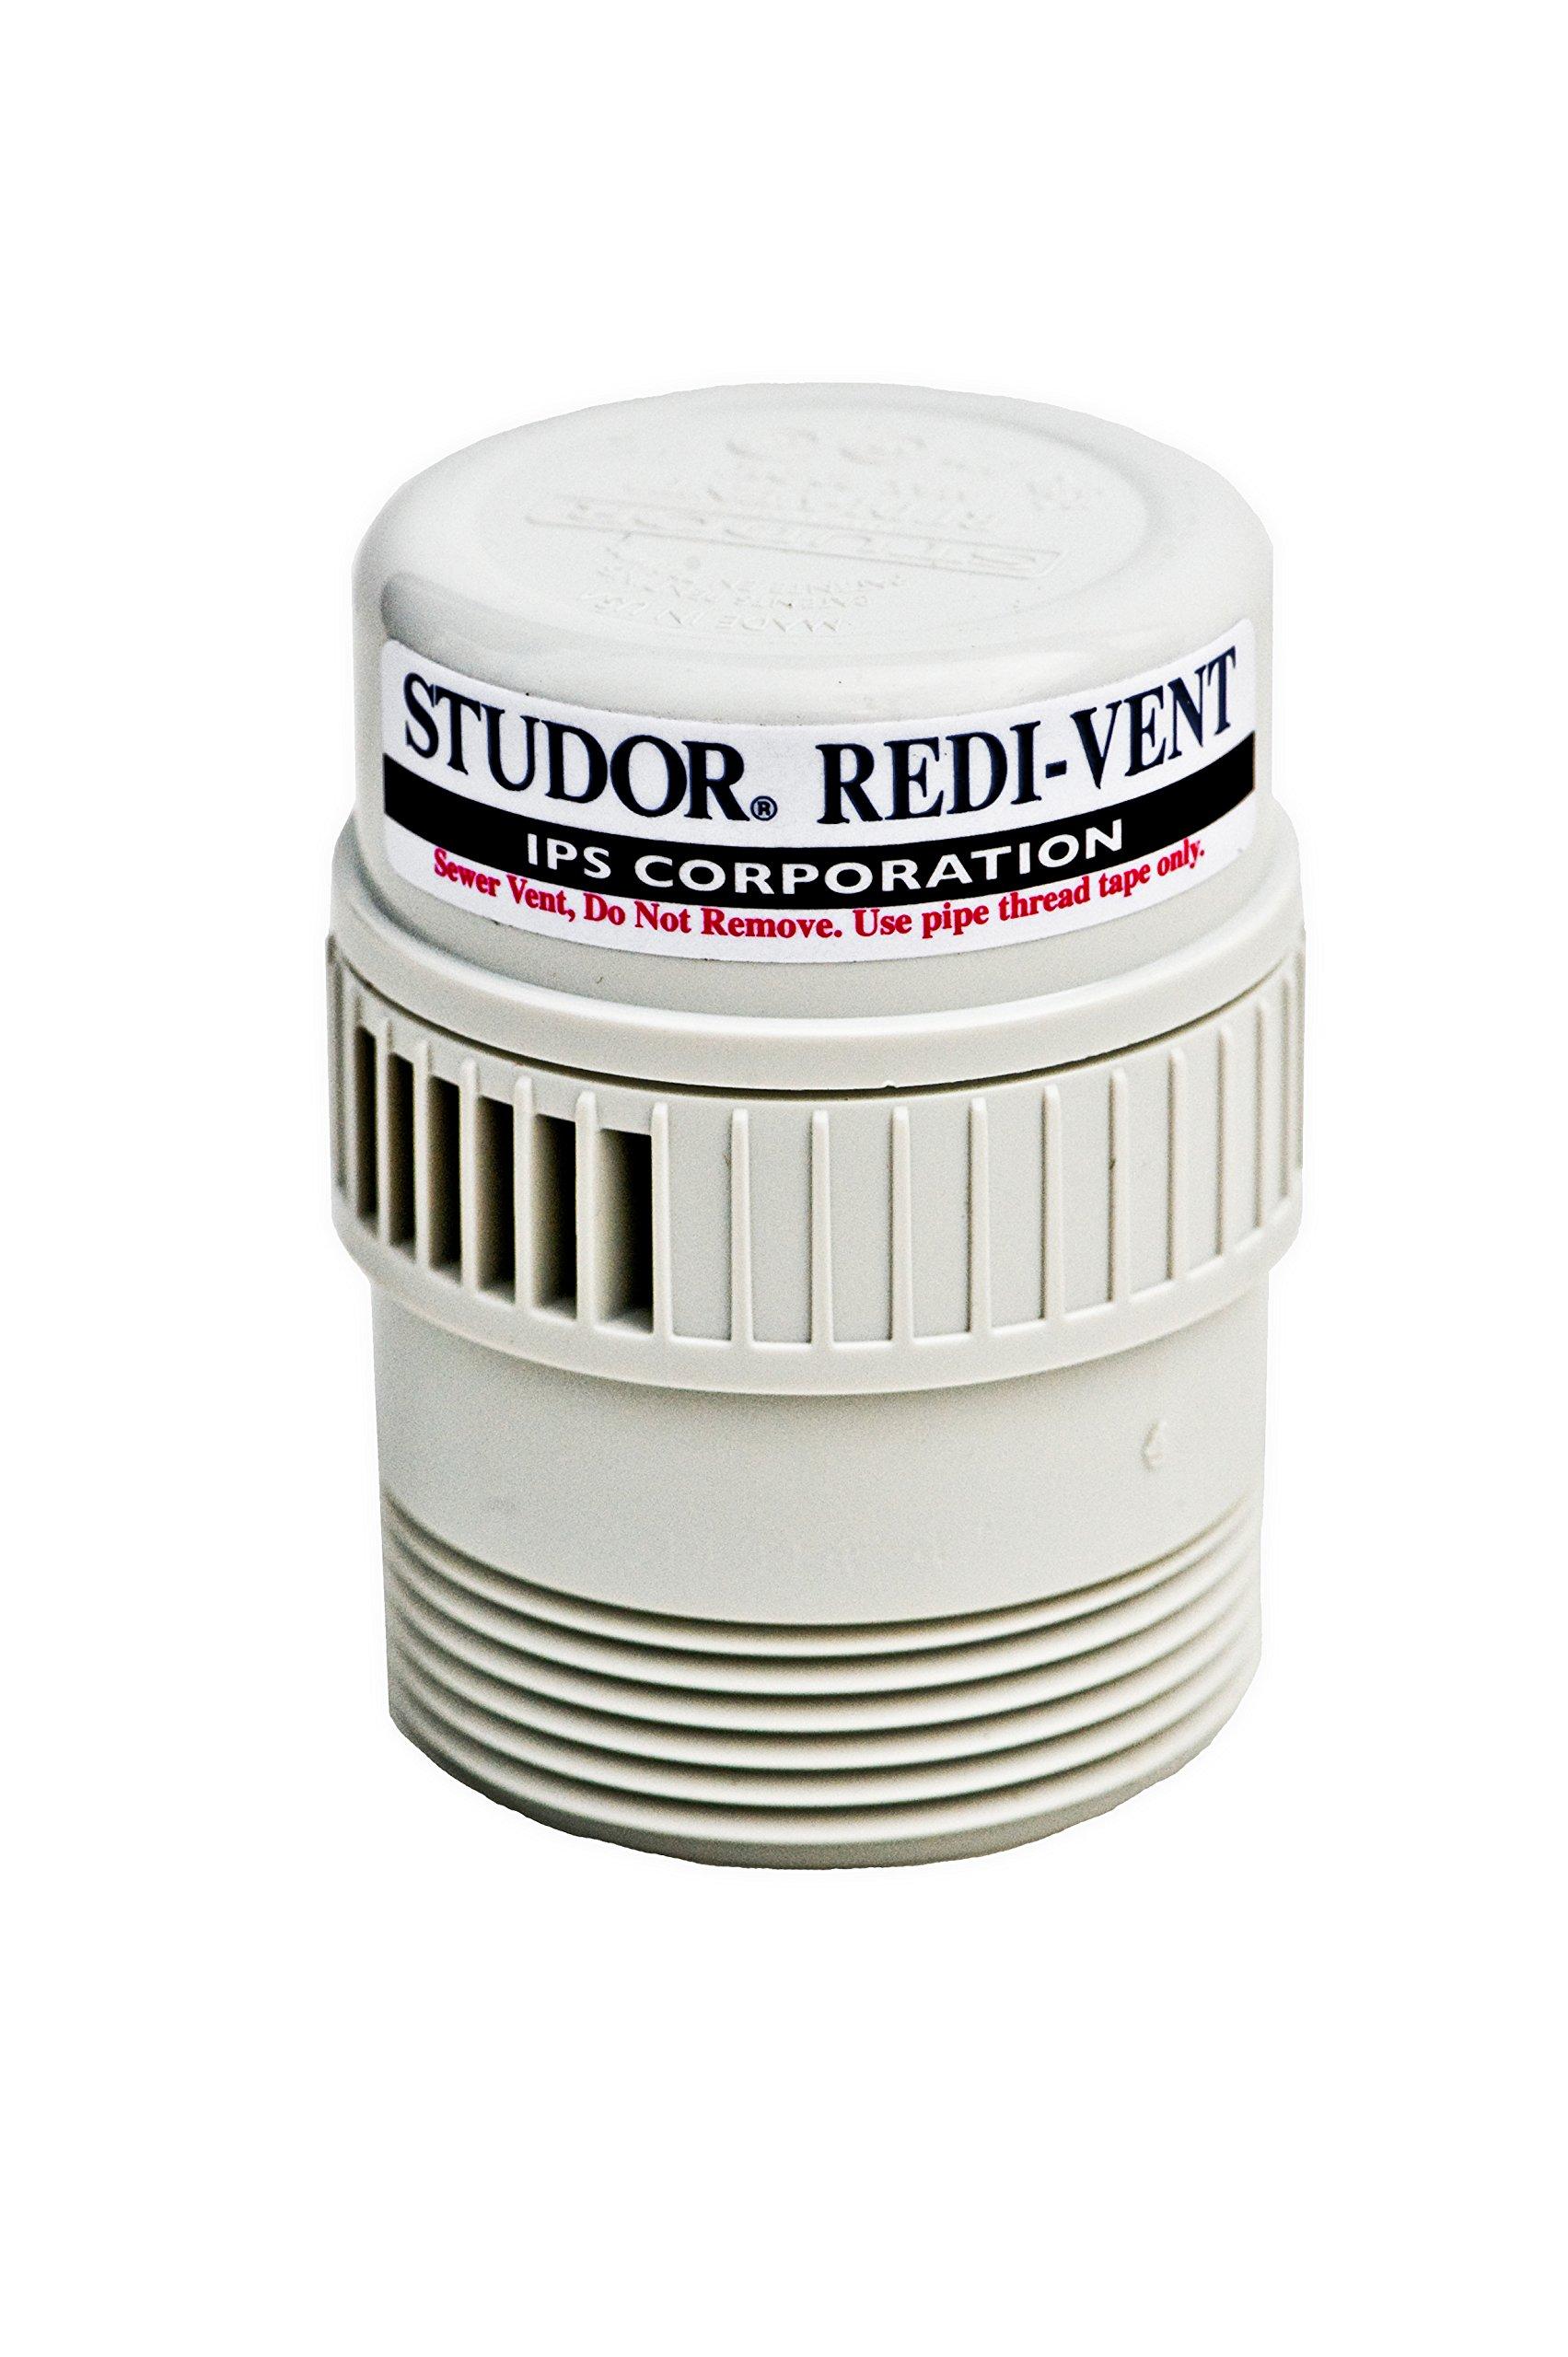 Studor 20346 REDI-VENT Air Admittance Valve, 1-1/2'' or 2'' PVC Adapter, White